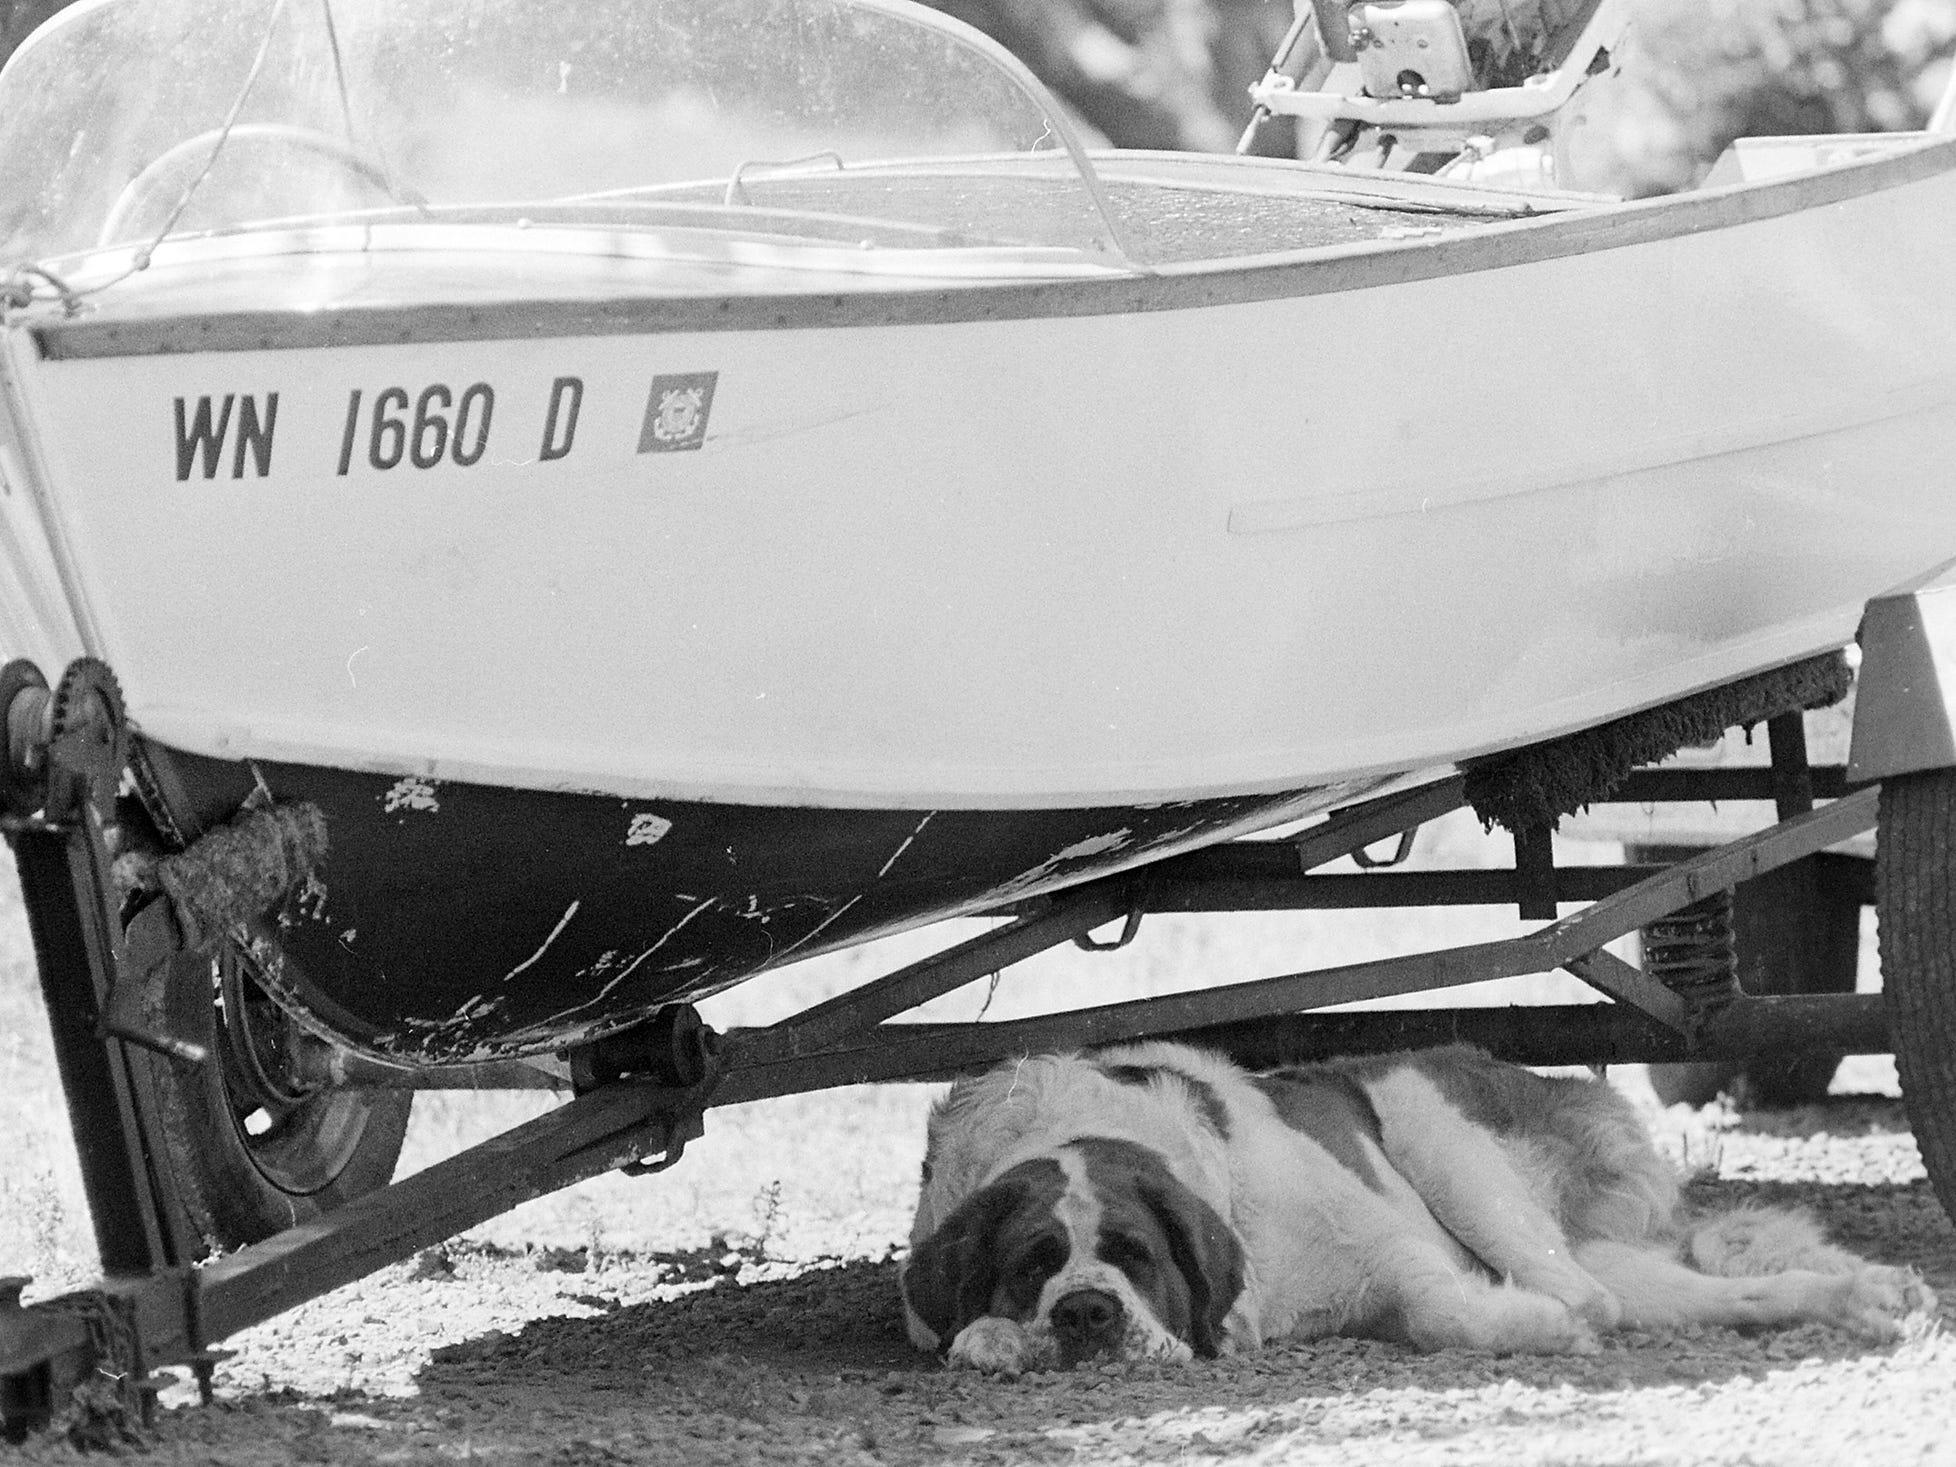 08/03/77Dog Under Boat